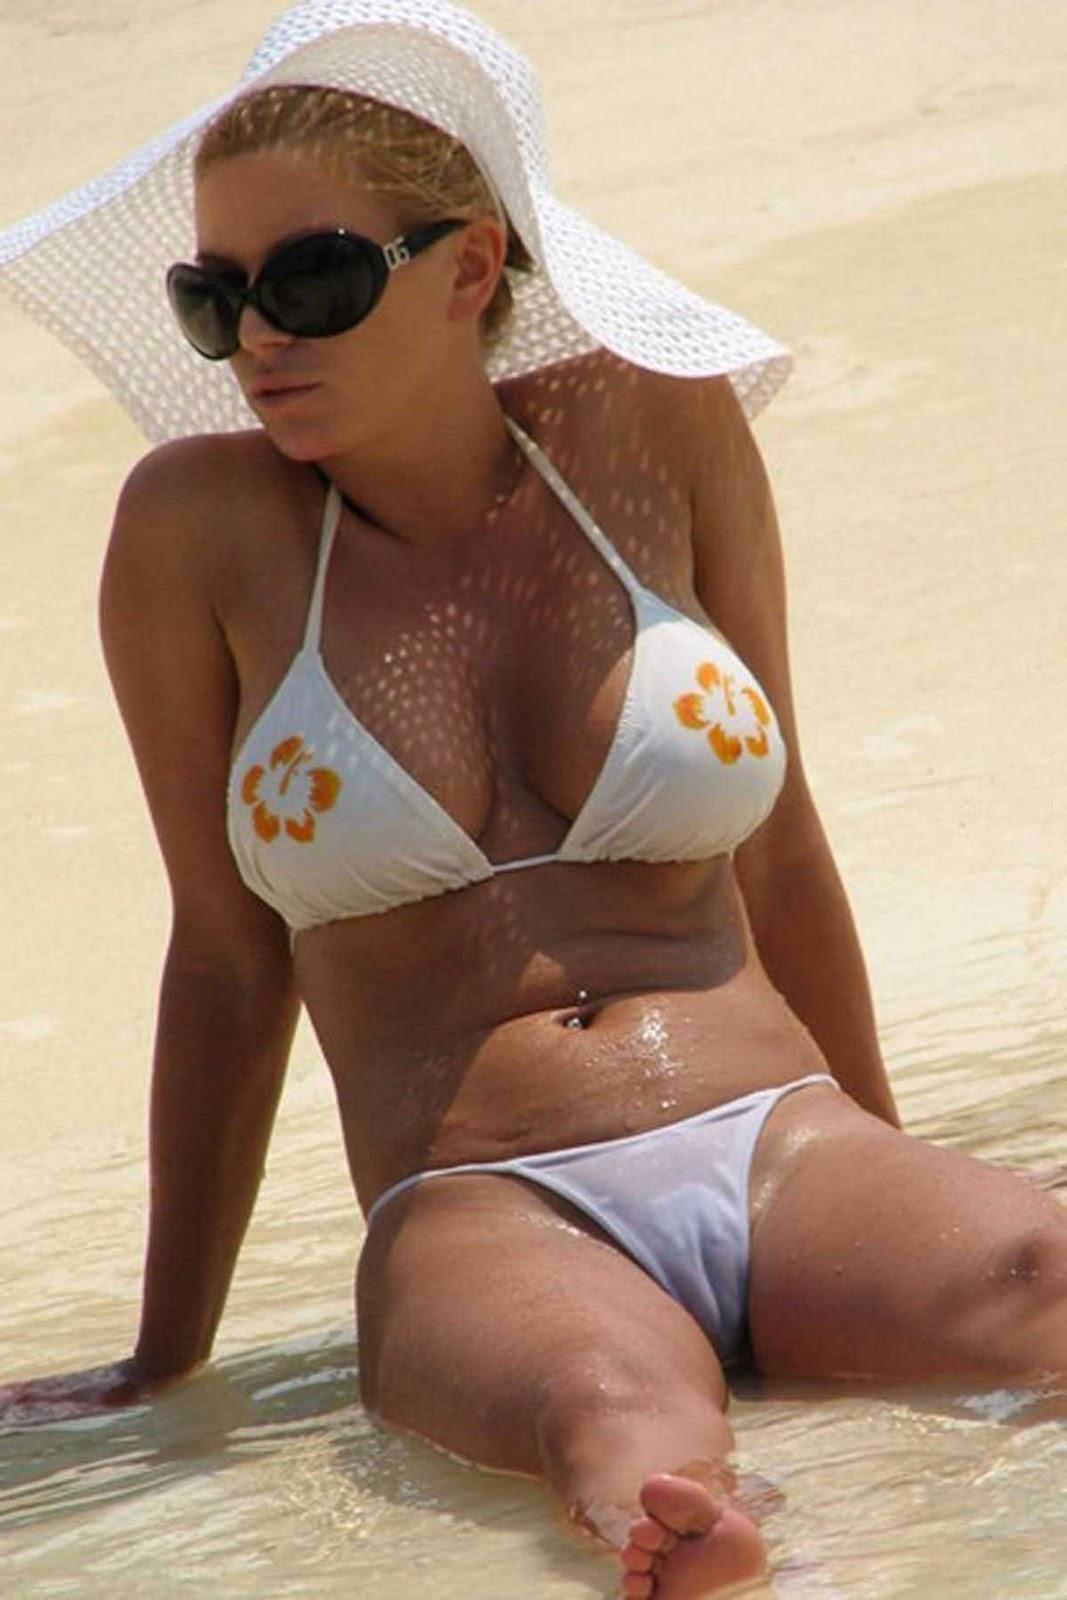 Hot Legs Bikini Cameltoe Sex Porn Images